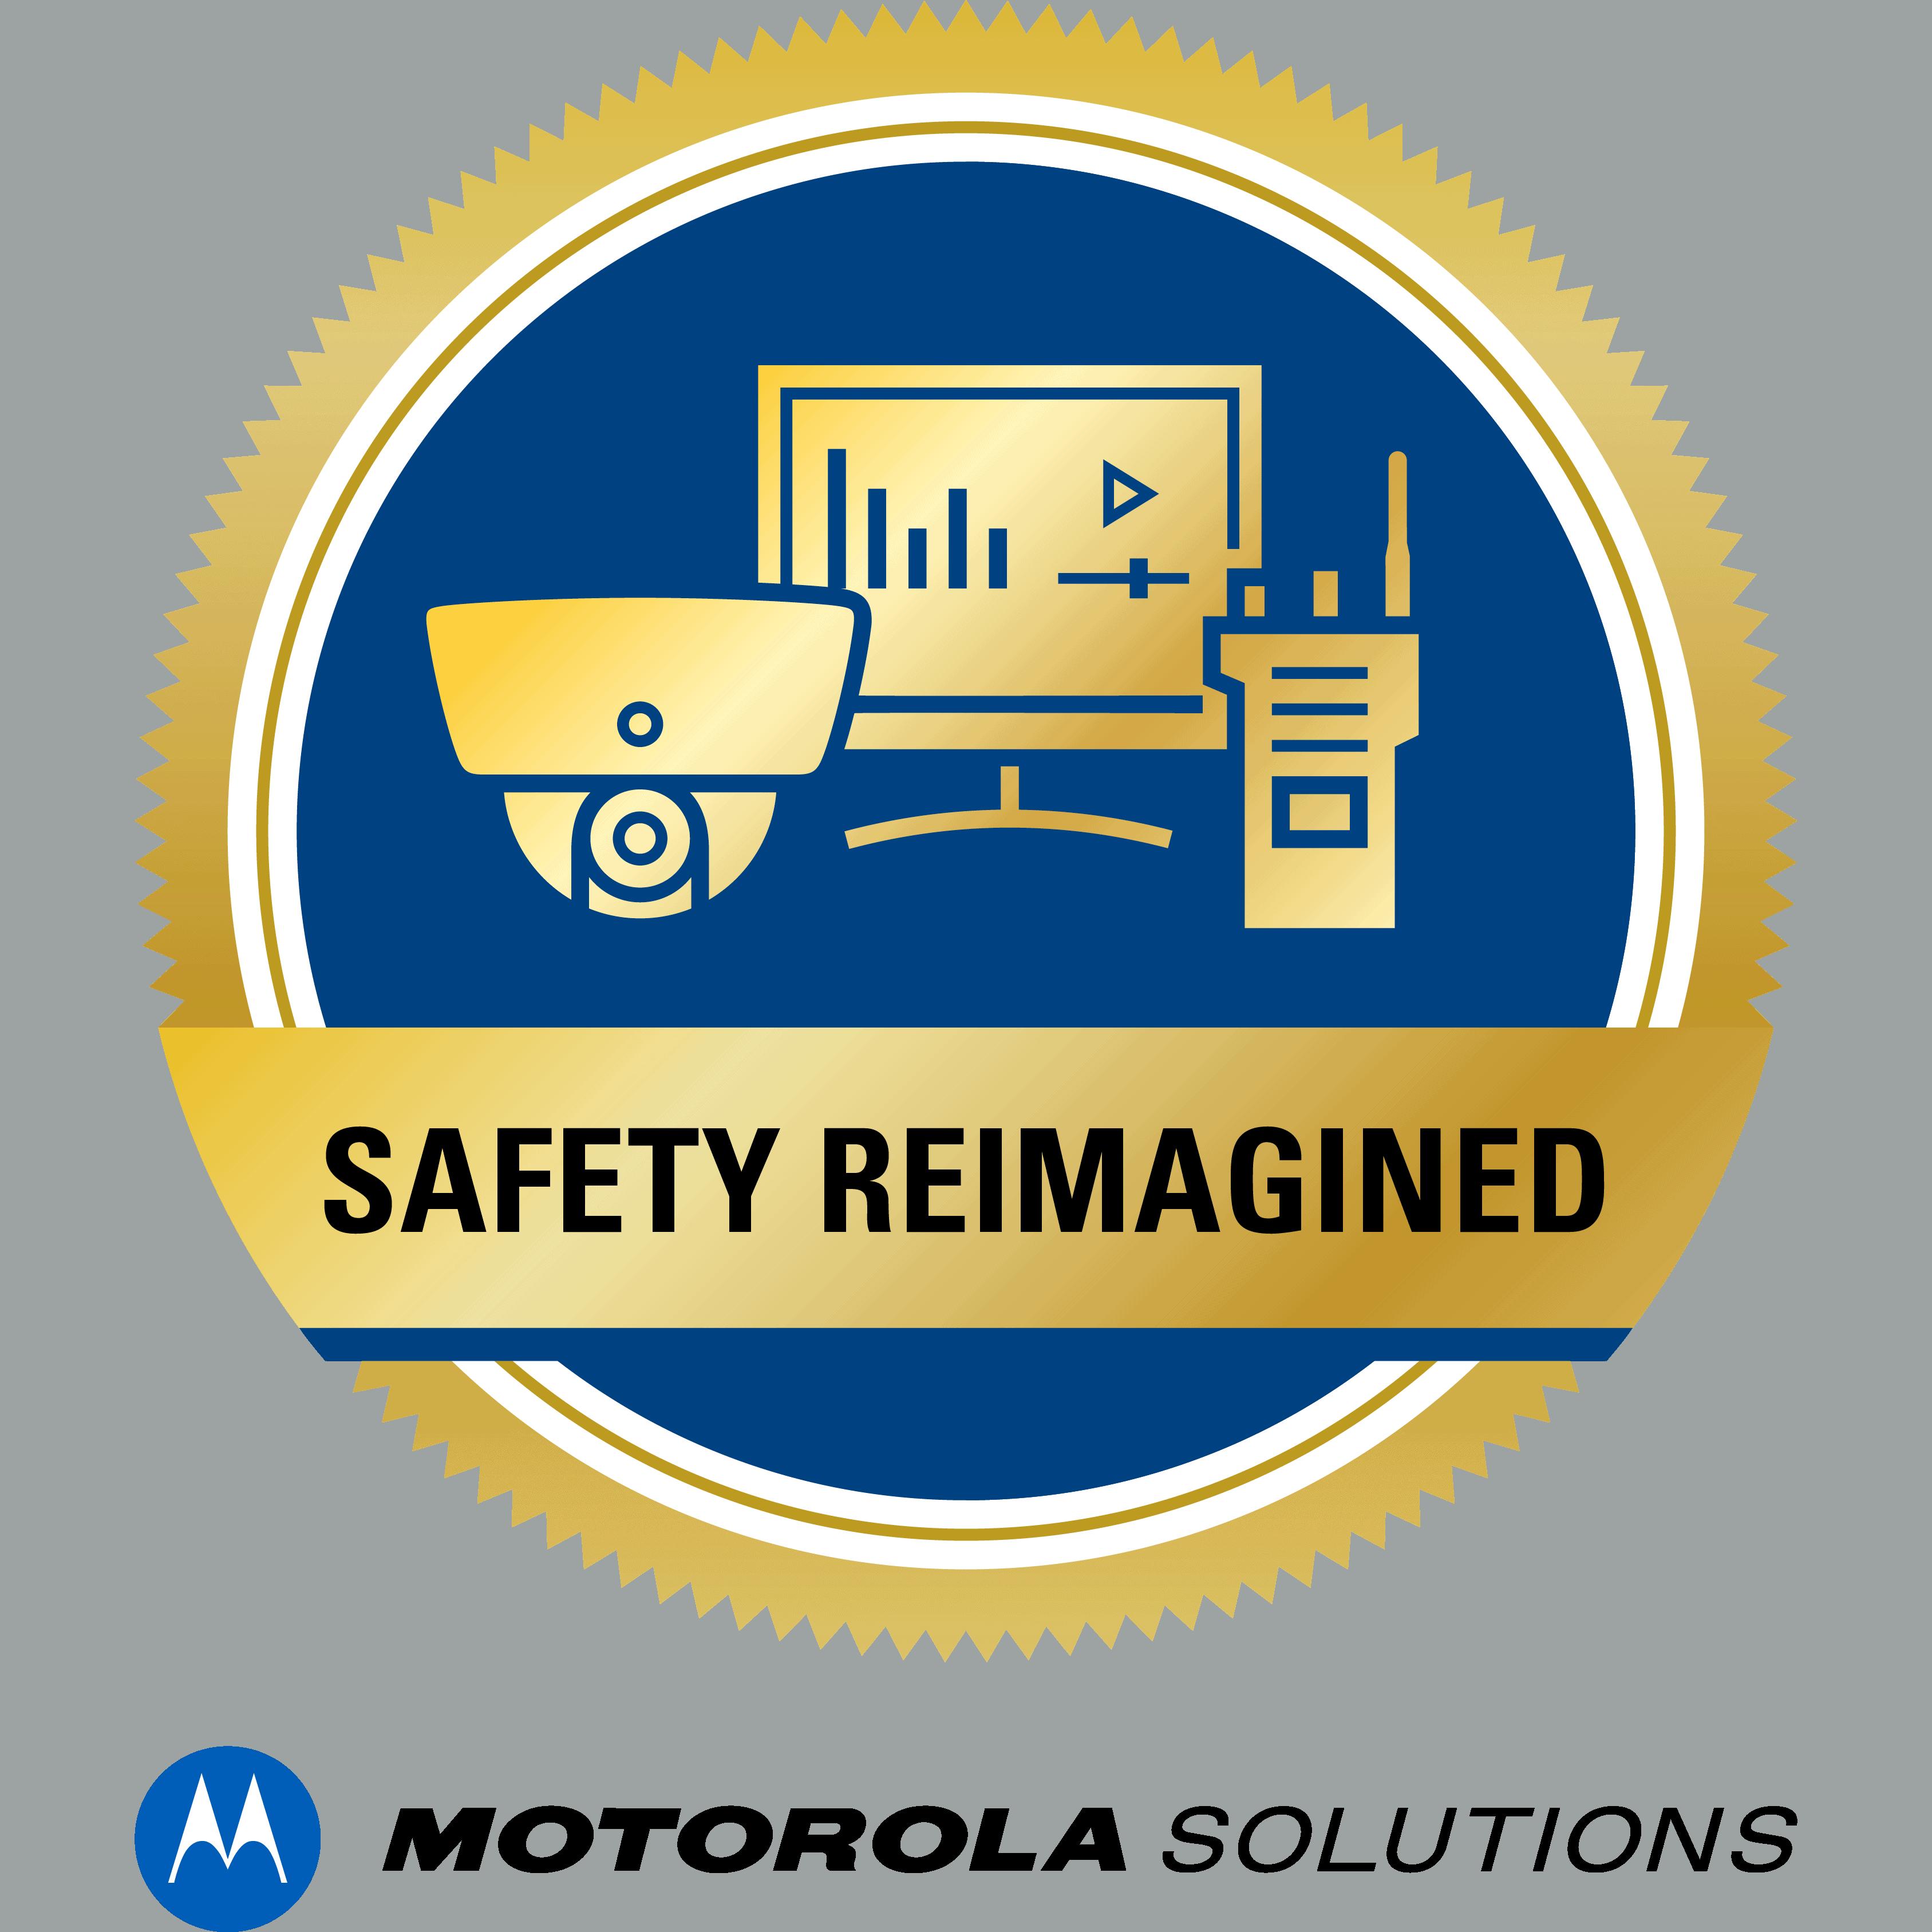 Motorola Solutions Safety-Reimagined-Badge